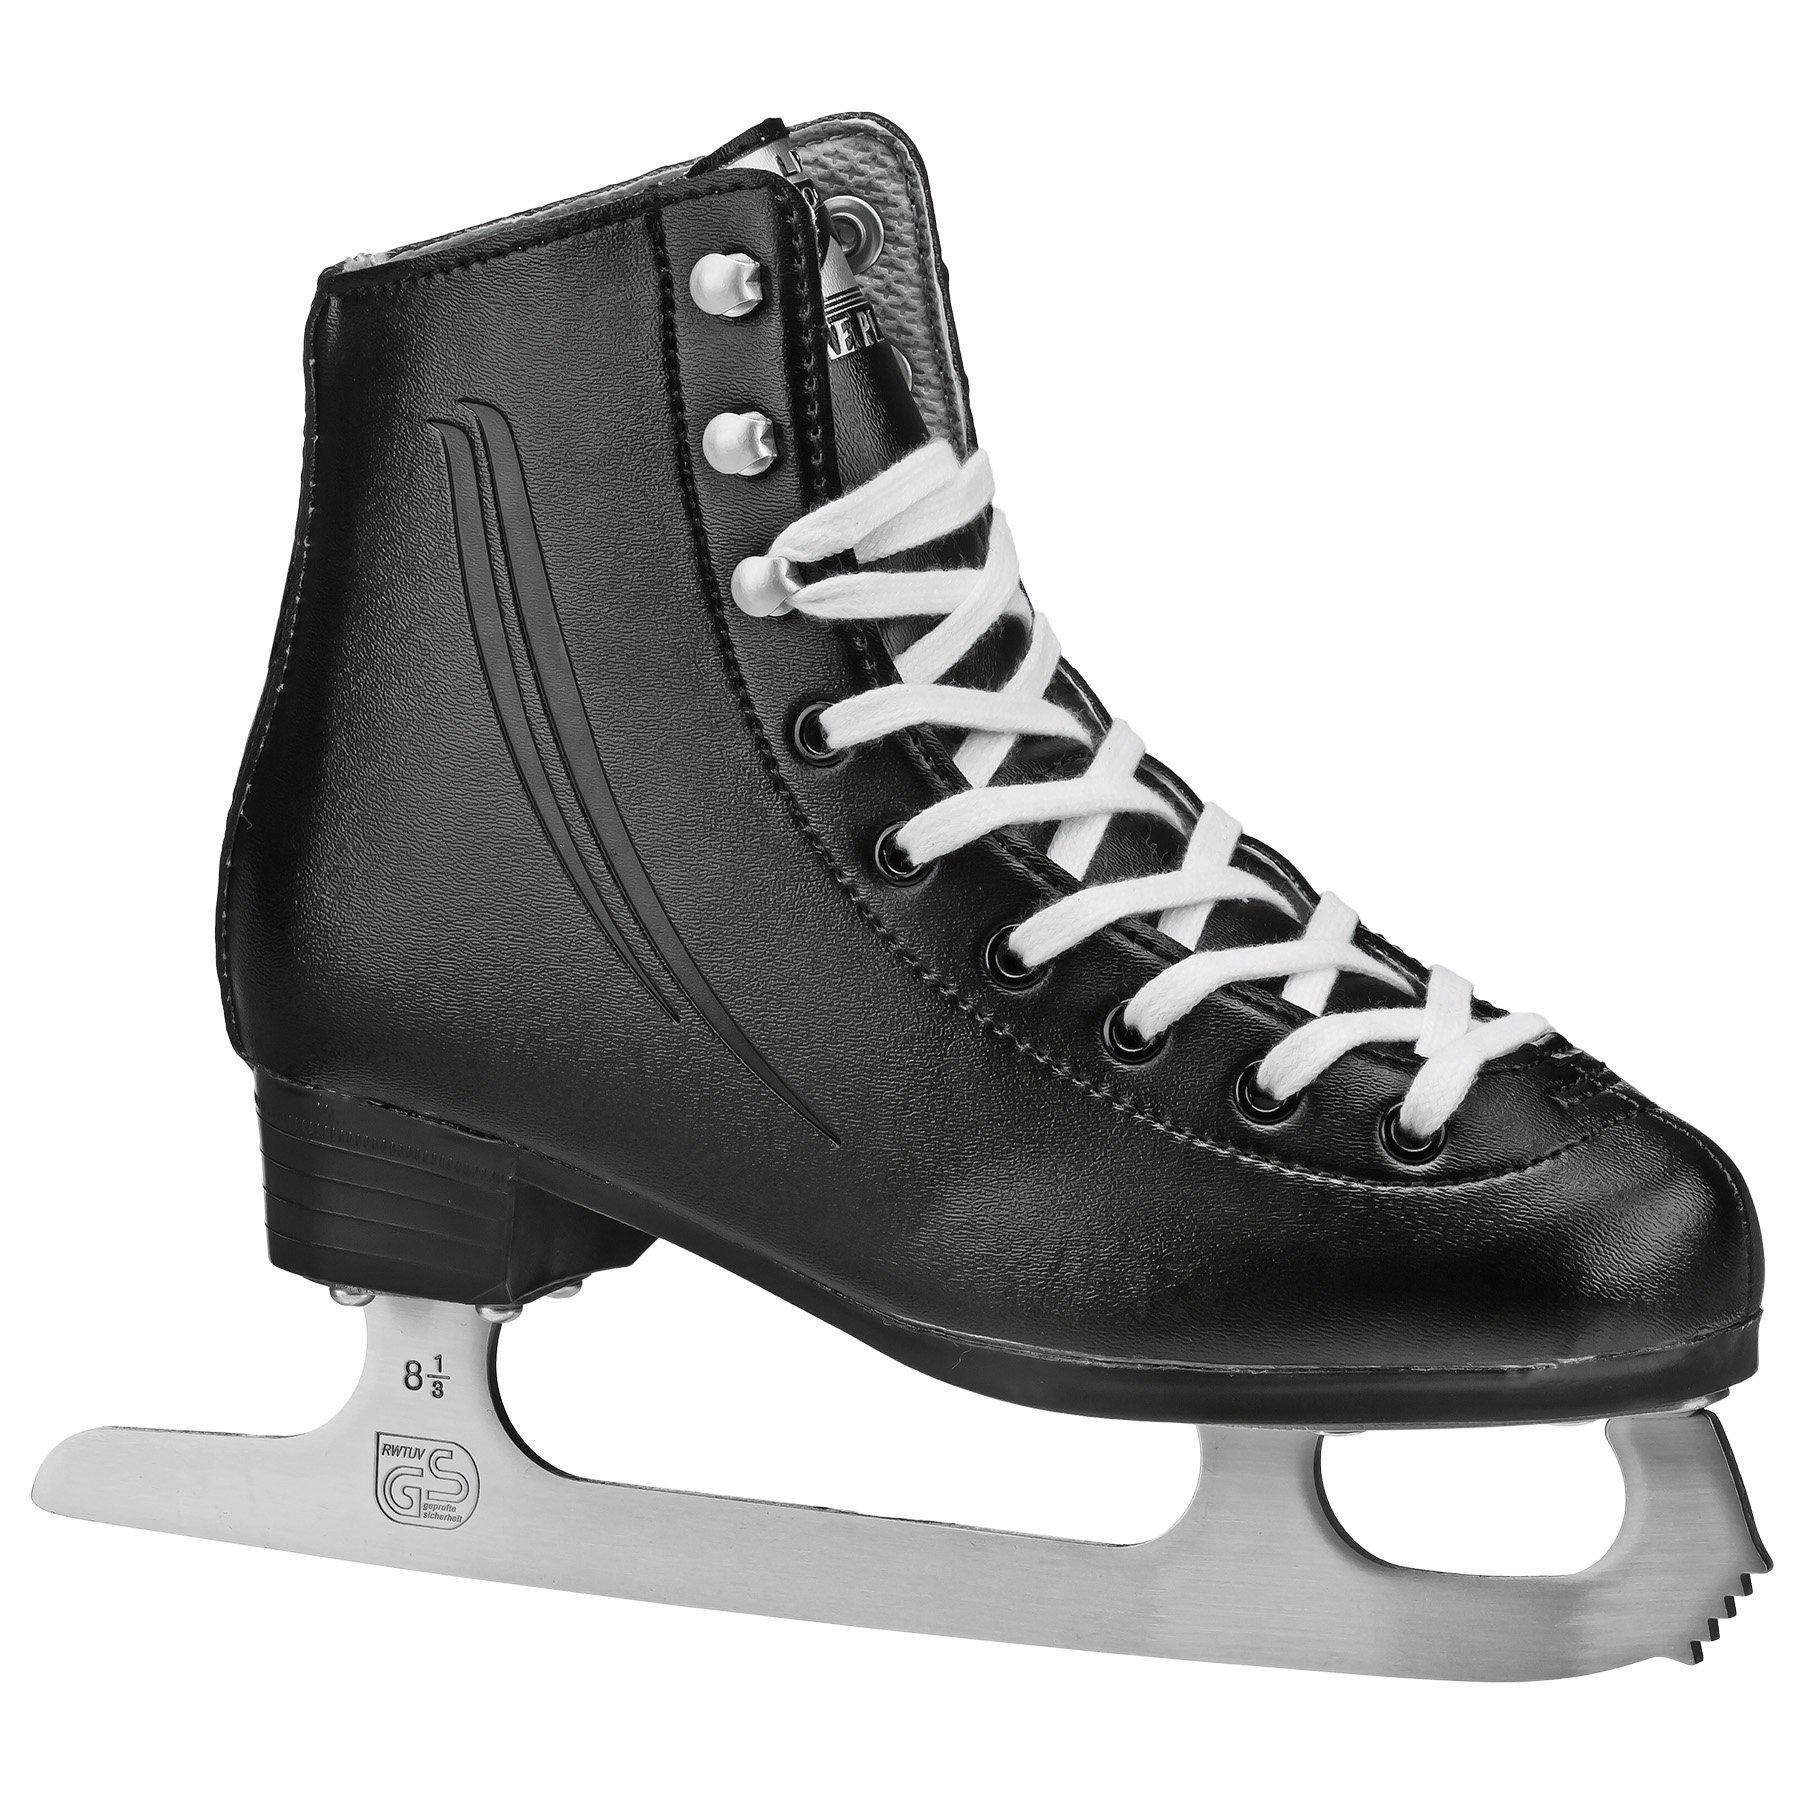 Lake Placid Cascade Boys Figure Ice Skate, Black, Size Youth 13 by Lake Placid